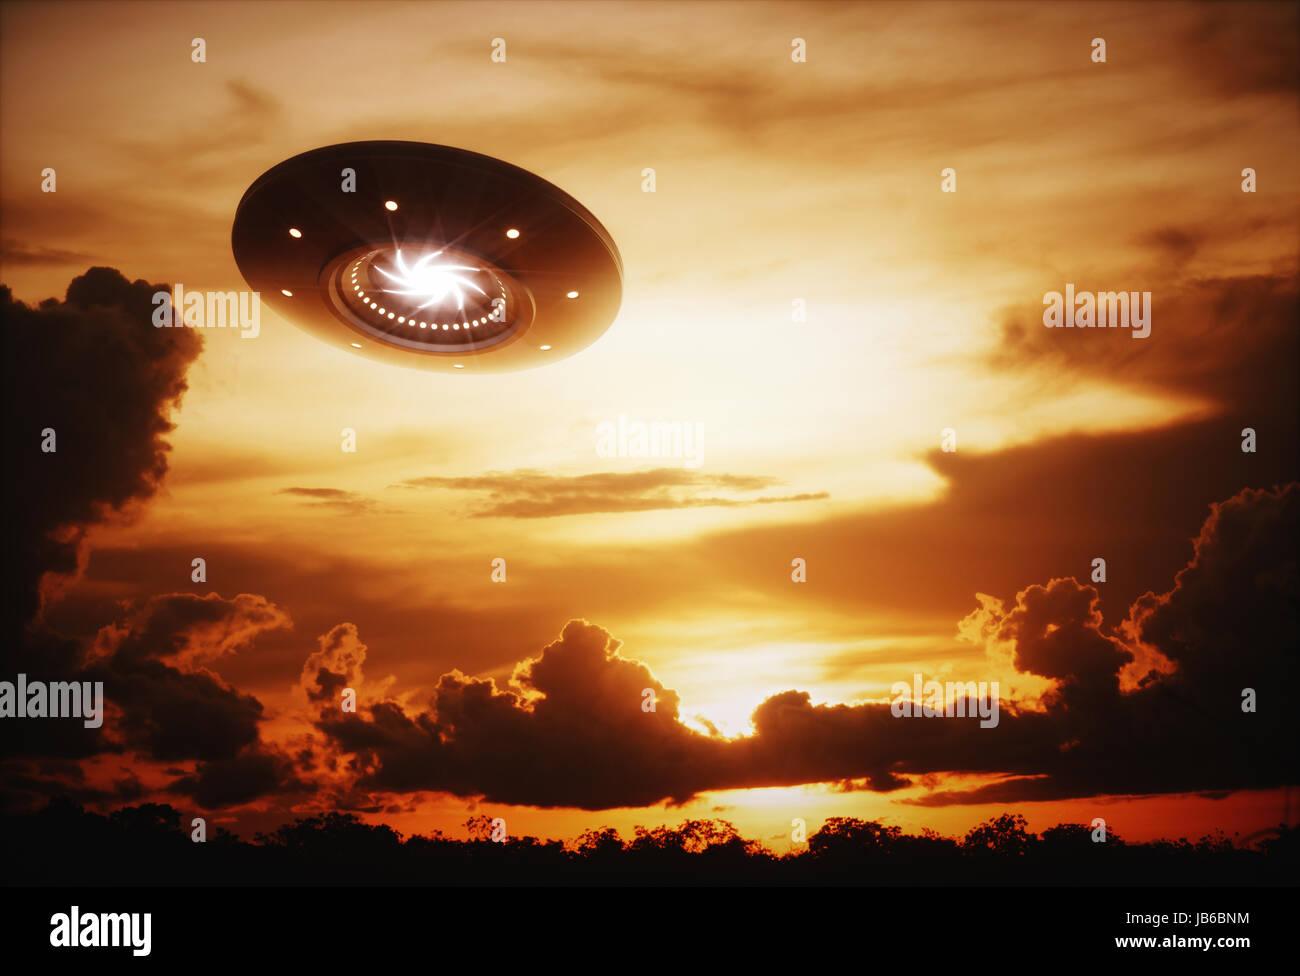 Ufo in sky, backlit, illustration. - Stock Image